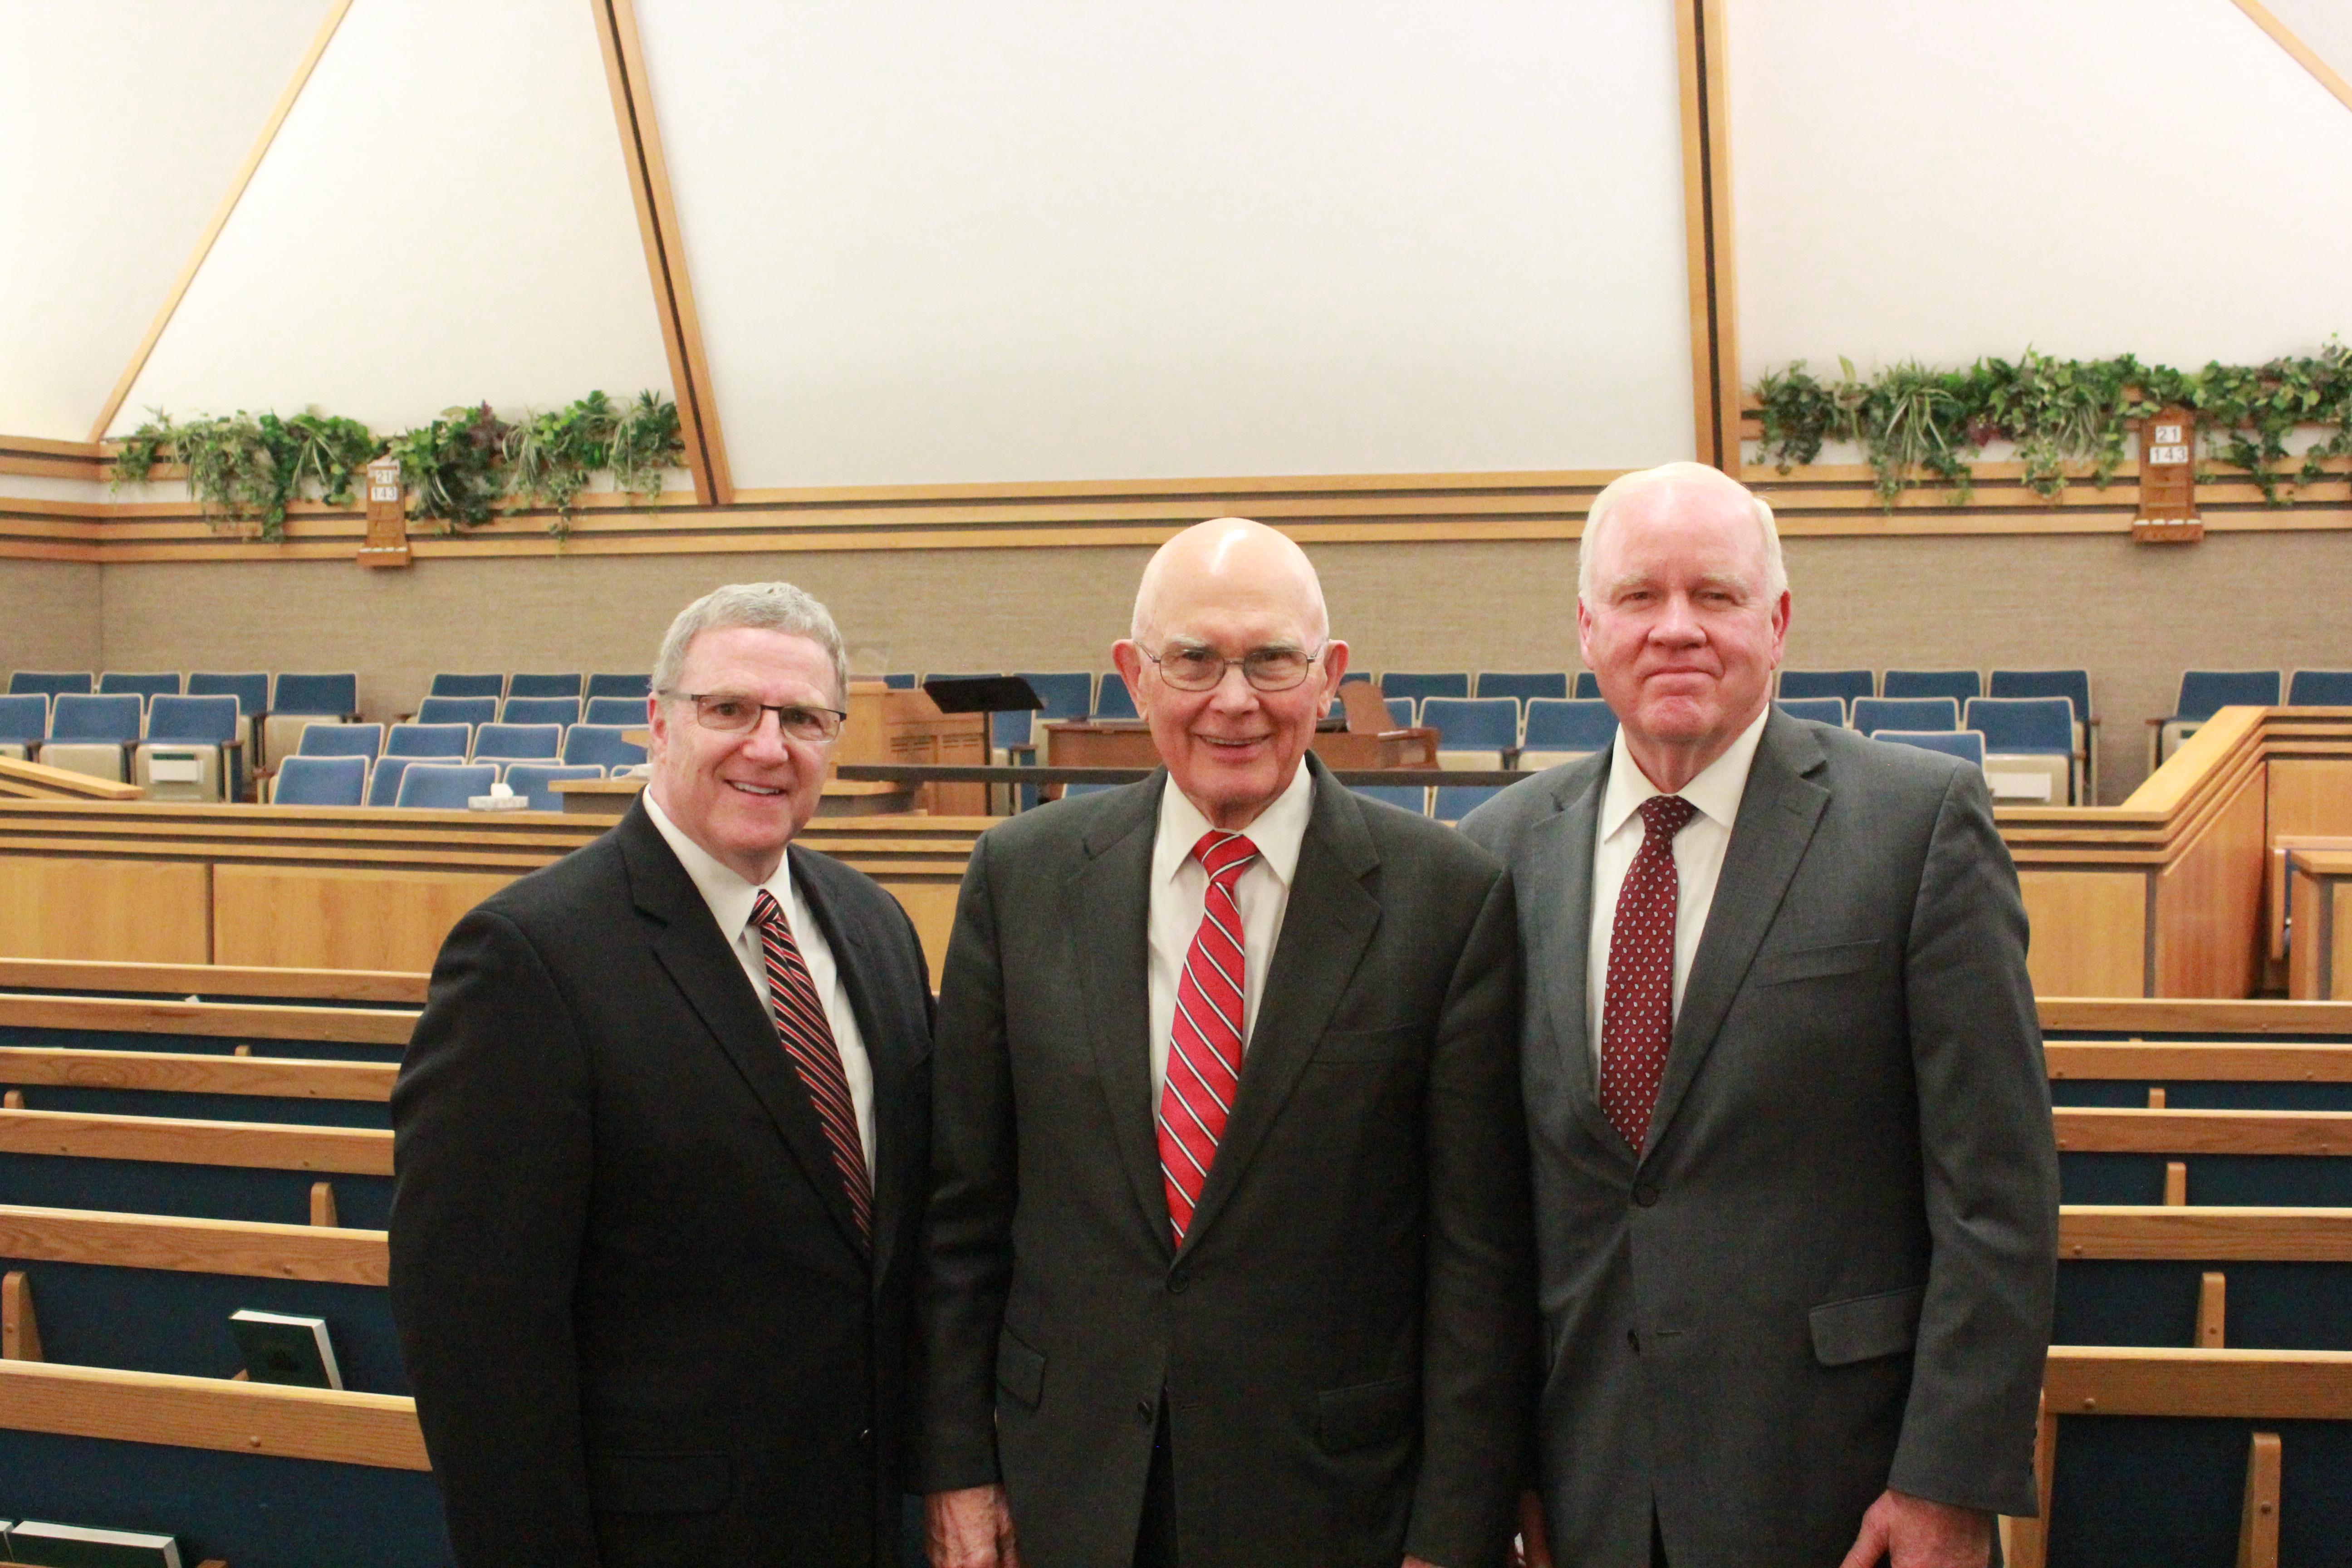 President Dallin H. Oaks, center; Elder Wilford W. Andersen, General Authority Seventy, right; and Elder Raymond S. Heyman, Area Seventy, participate in devotional in the Round Valley Dome in Eagar, Ariz. on Sept. 14, 2019.